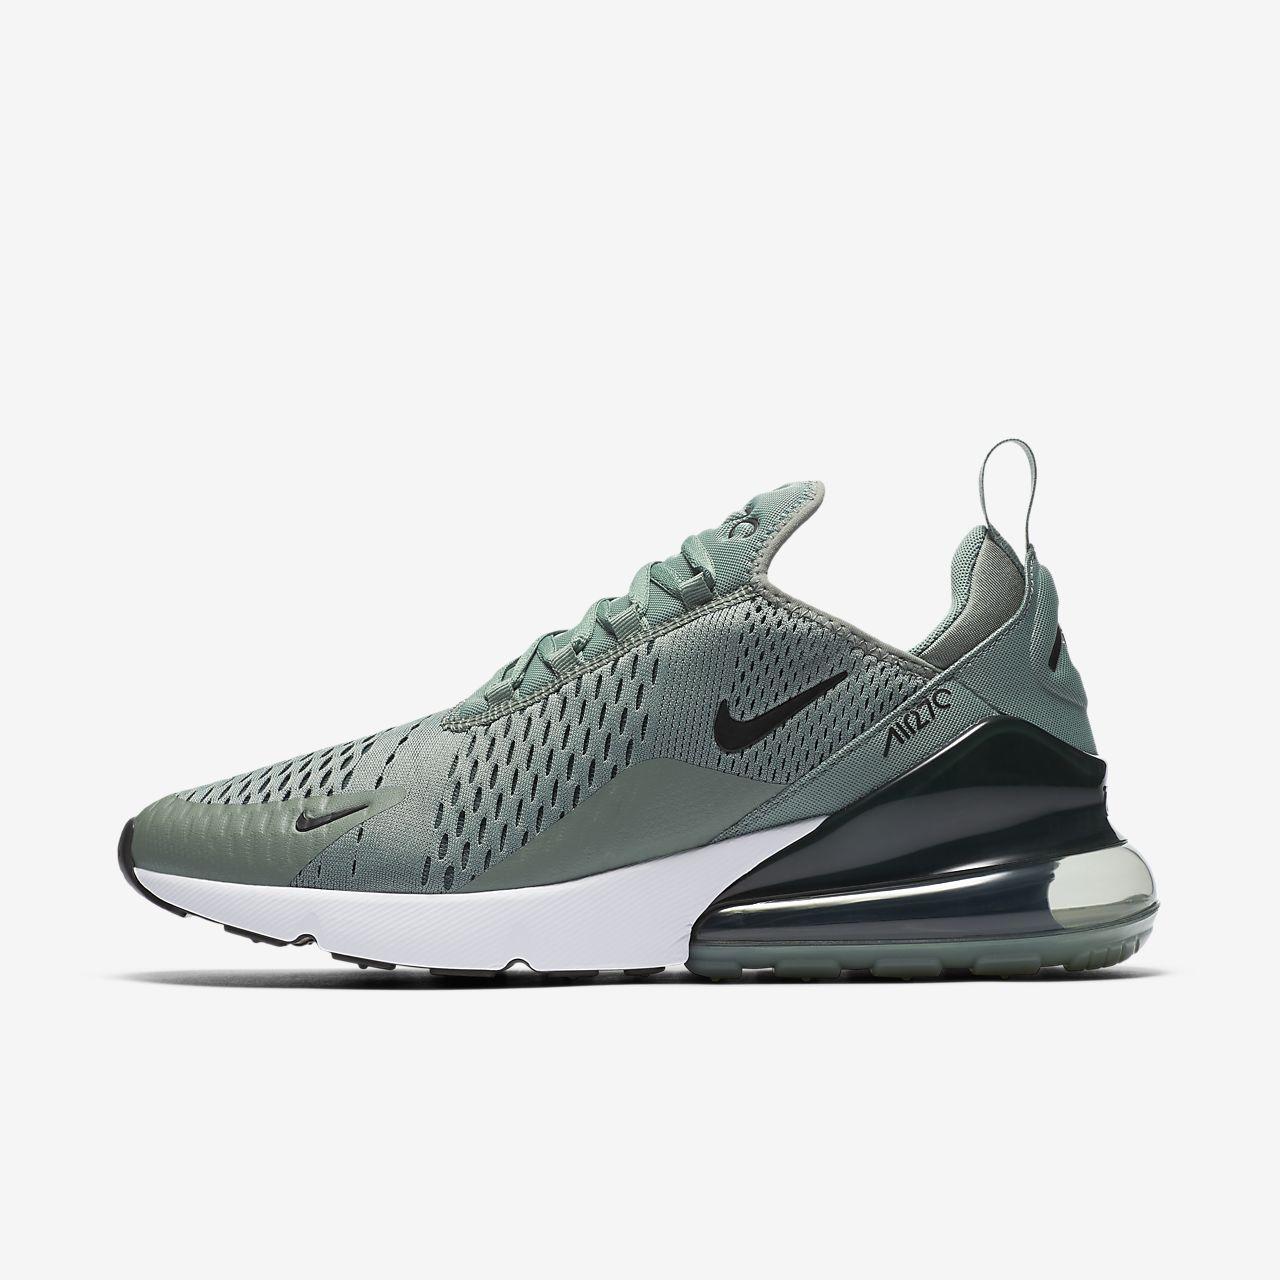 nuove scarpe nike air max